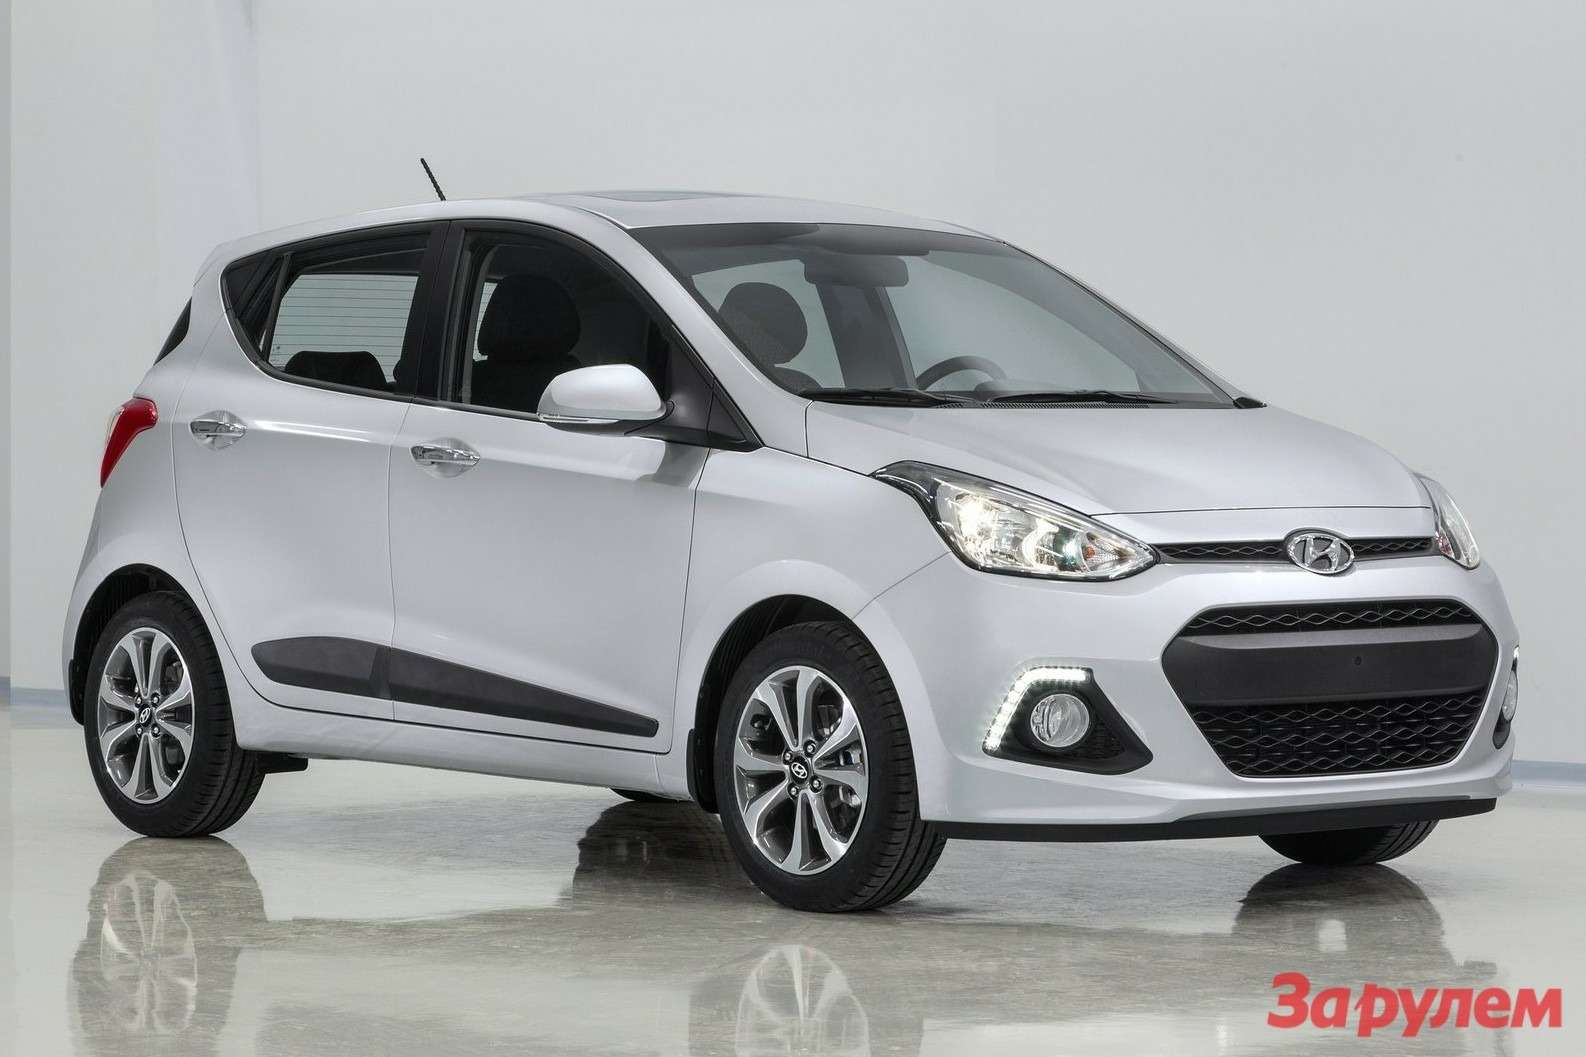 Hyundai i10 2014 1600x1200 wallpaper 01